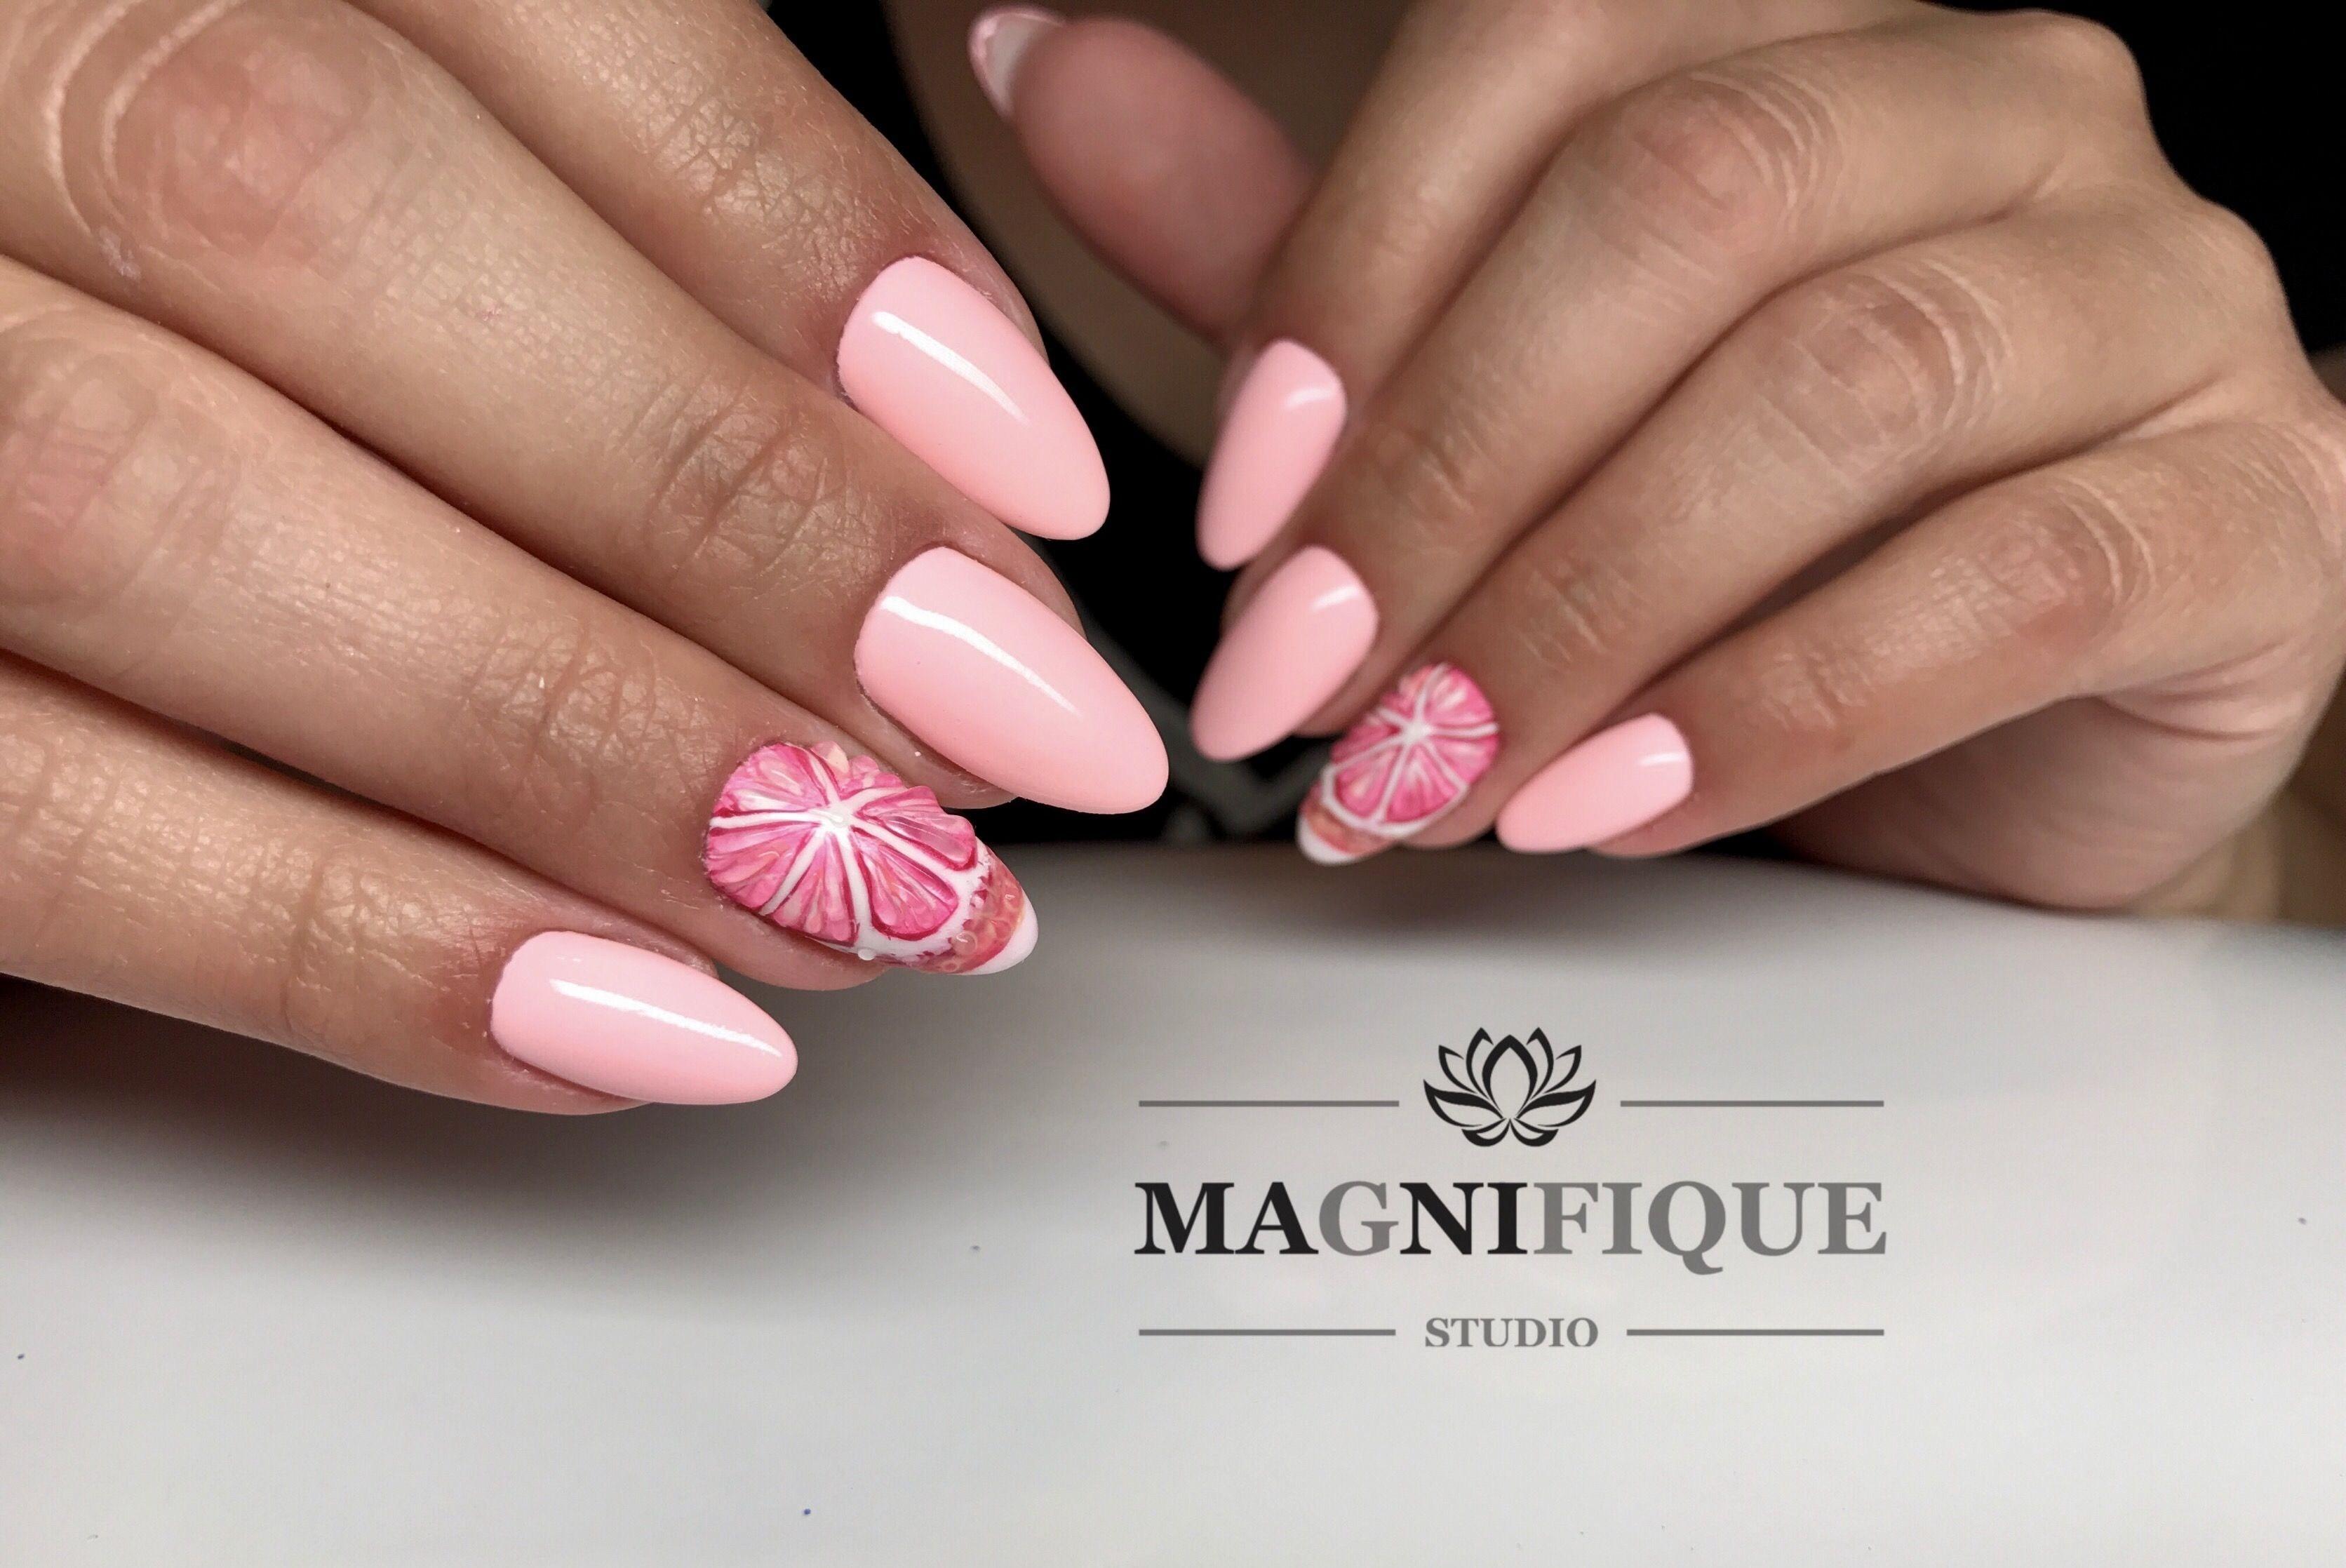 com : Dried Flower Gel Nail Polish, Saviland 6 Colors Soak Off UV  LED Nail Varnish Decoration Manicure Nail Art Design Kit (Pink Blue Yellow)  :